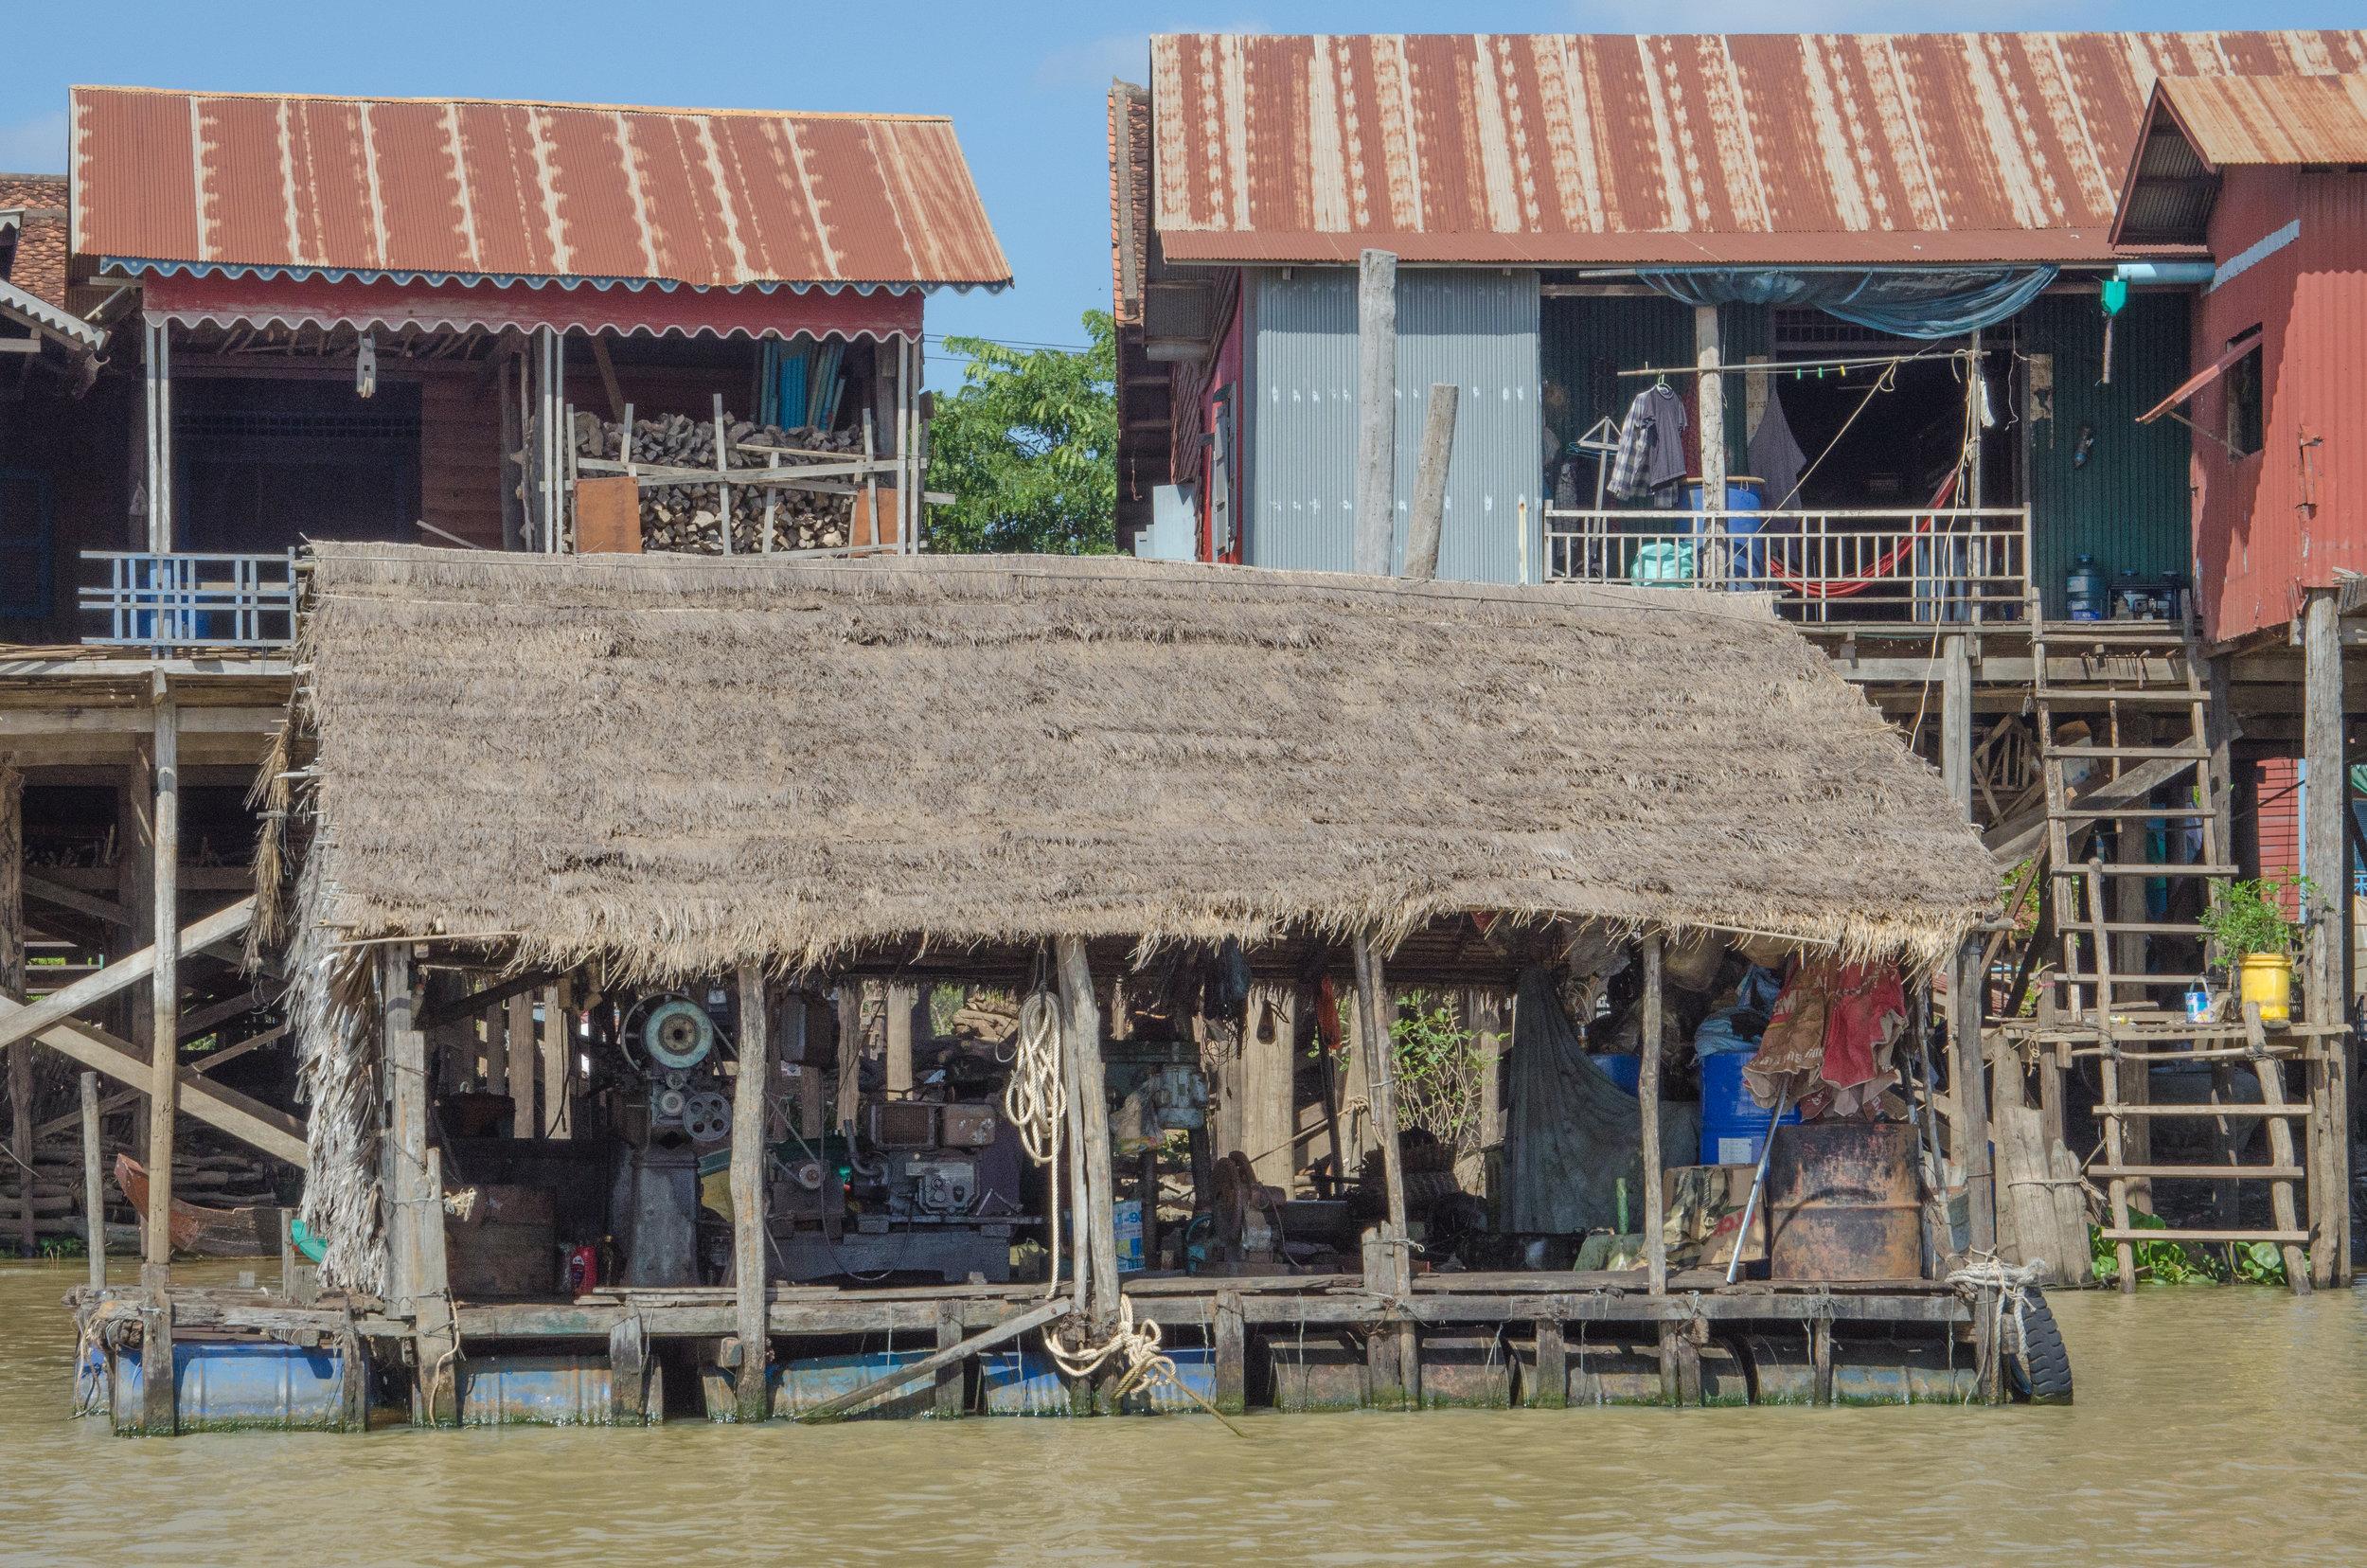 099 - Petrol station, Kompong Khleang village, en route to Tonle Sap Lake, Cambodia, 6 Dec 2017.jpg